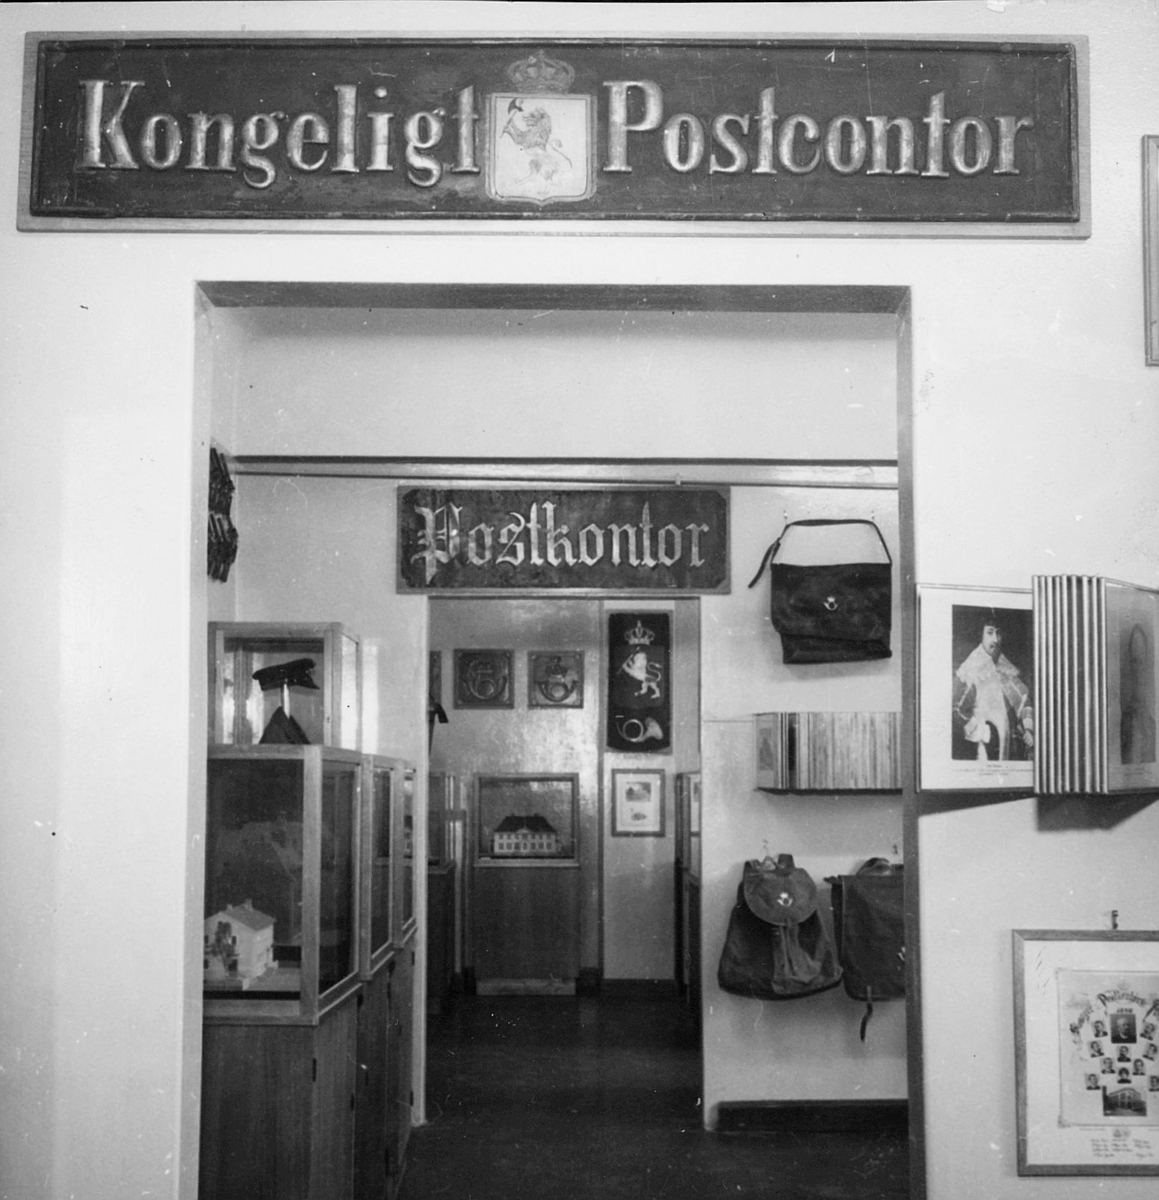 postmuseet, Dronningensgate 15, Oslo, 7. etasje, 1947-1957, kongelig postkontor, interiør